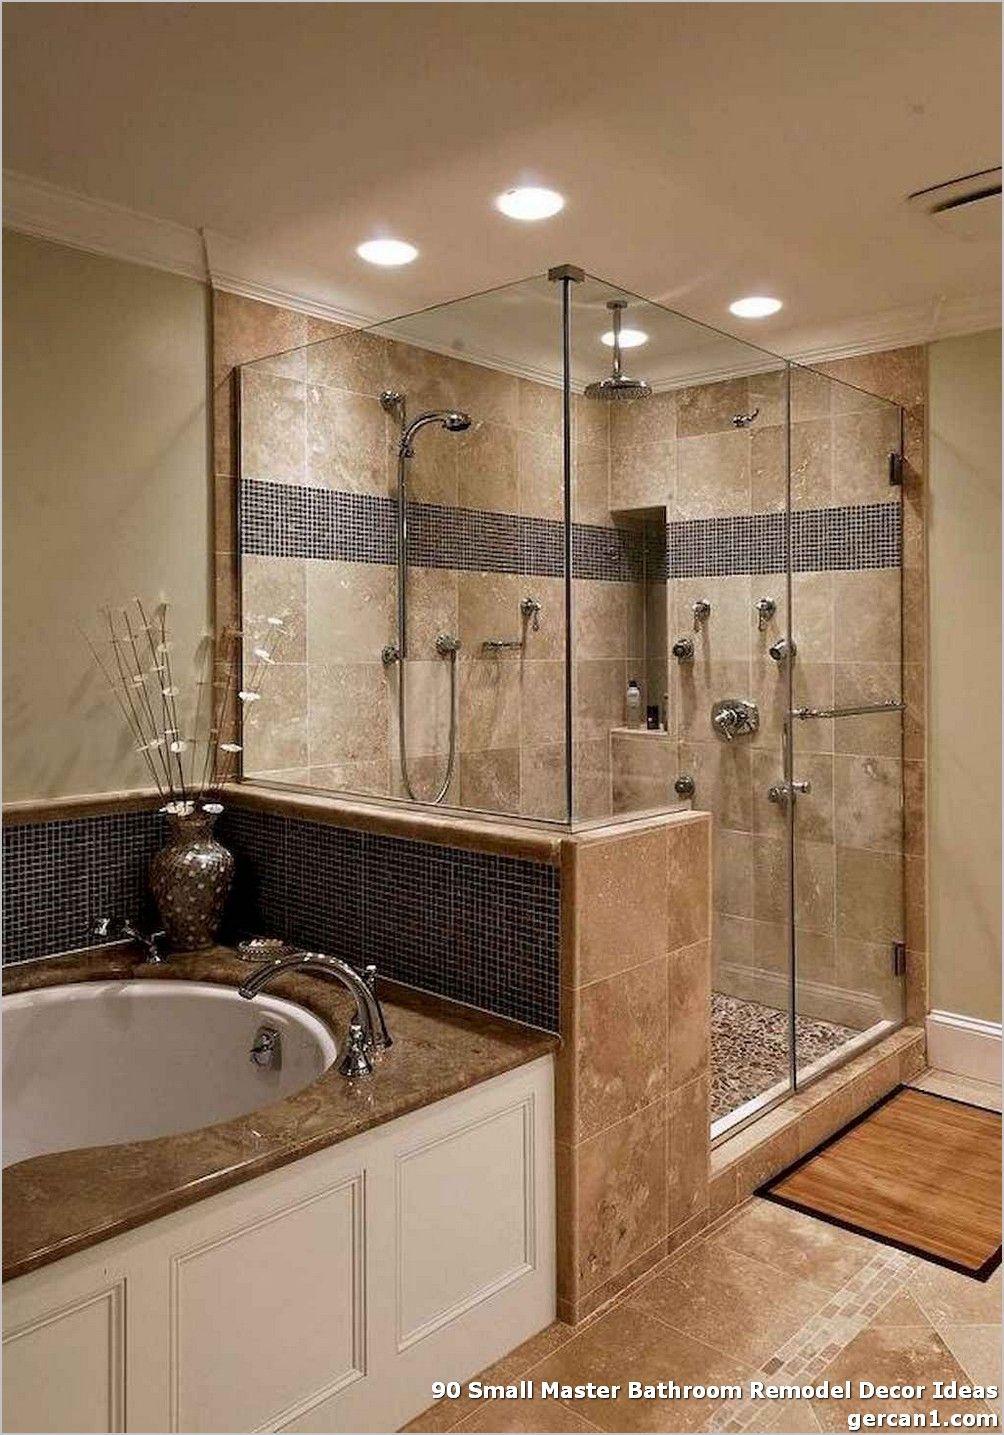 90 Small Master Bathroom Remodel Decor Ideas Luxury Master Bathrooms Bathroom Remodel Master Bathroom Remodel Shower